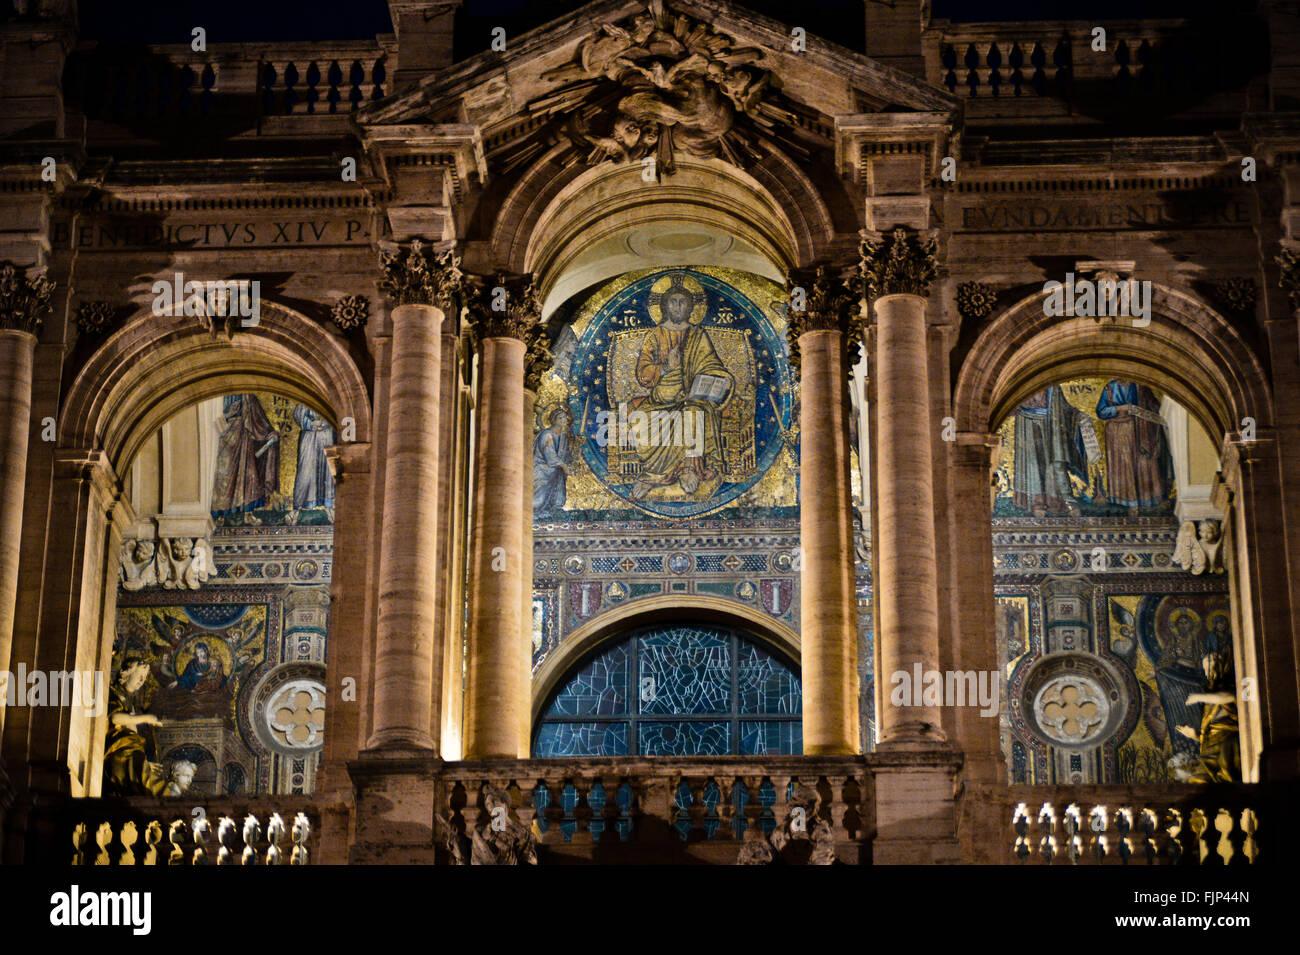 Dipinti Murali E Pittura Ad Ago : Pitture murali bizantine immagini & pitture murali bizantine fotos